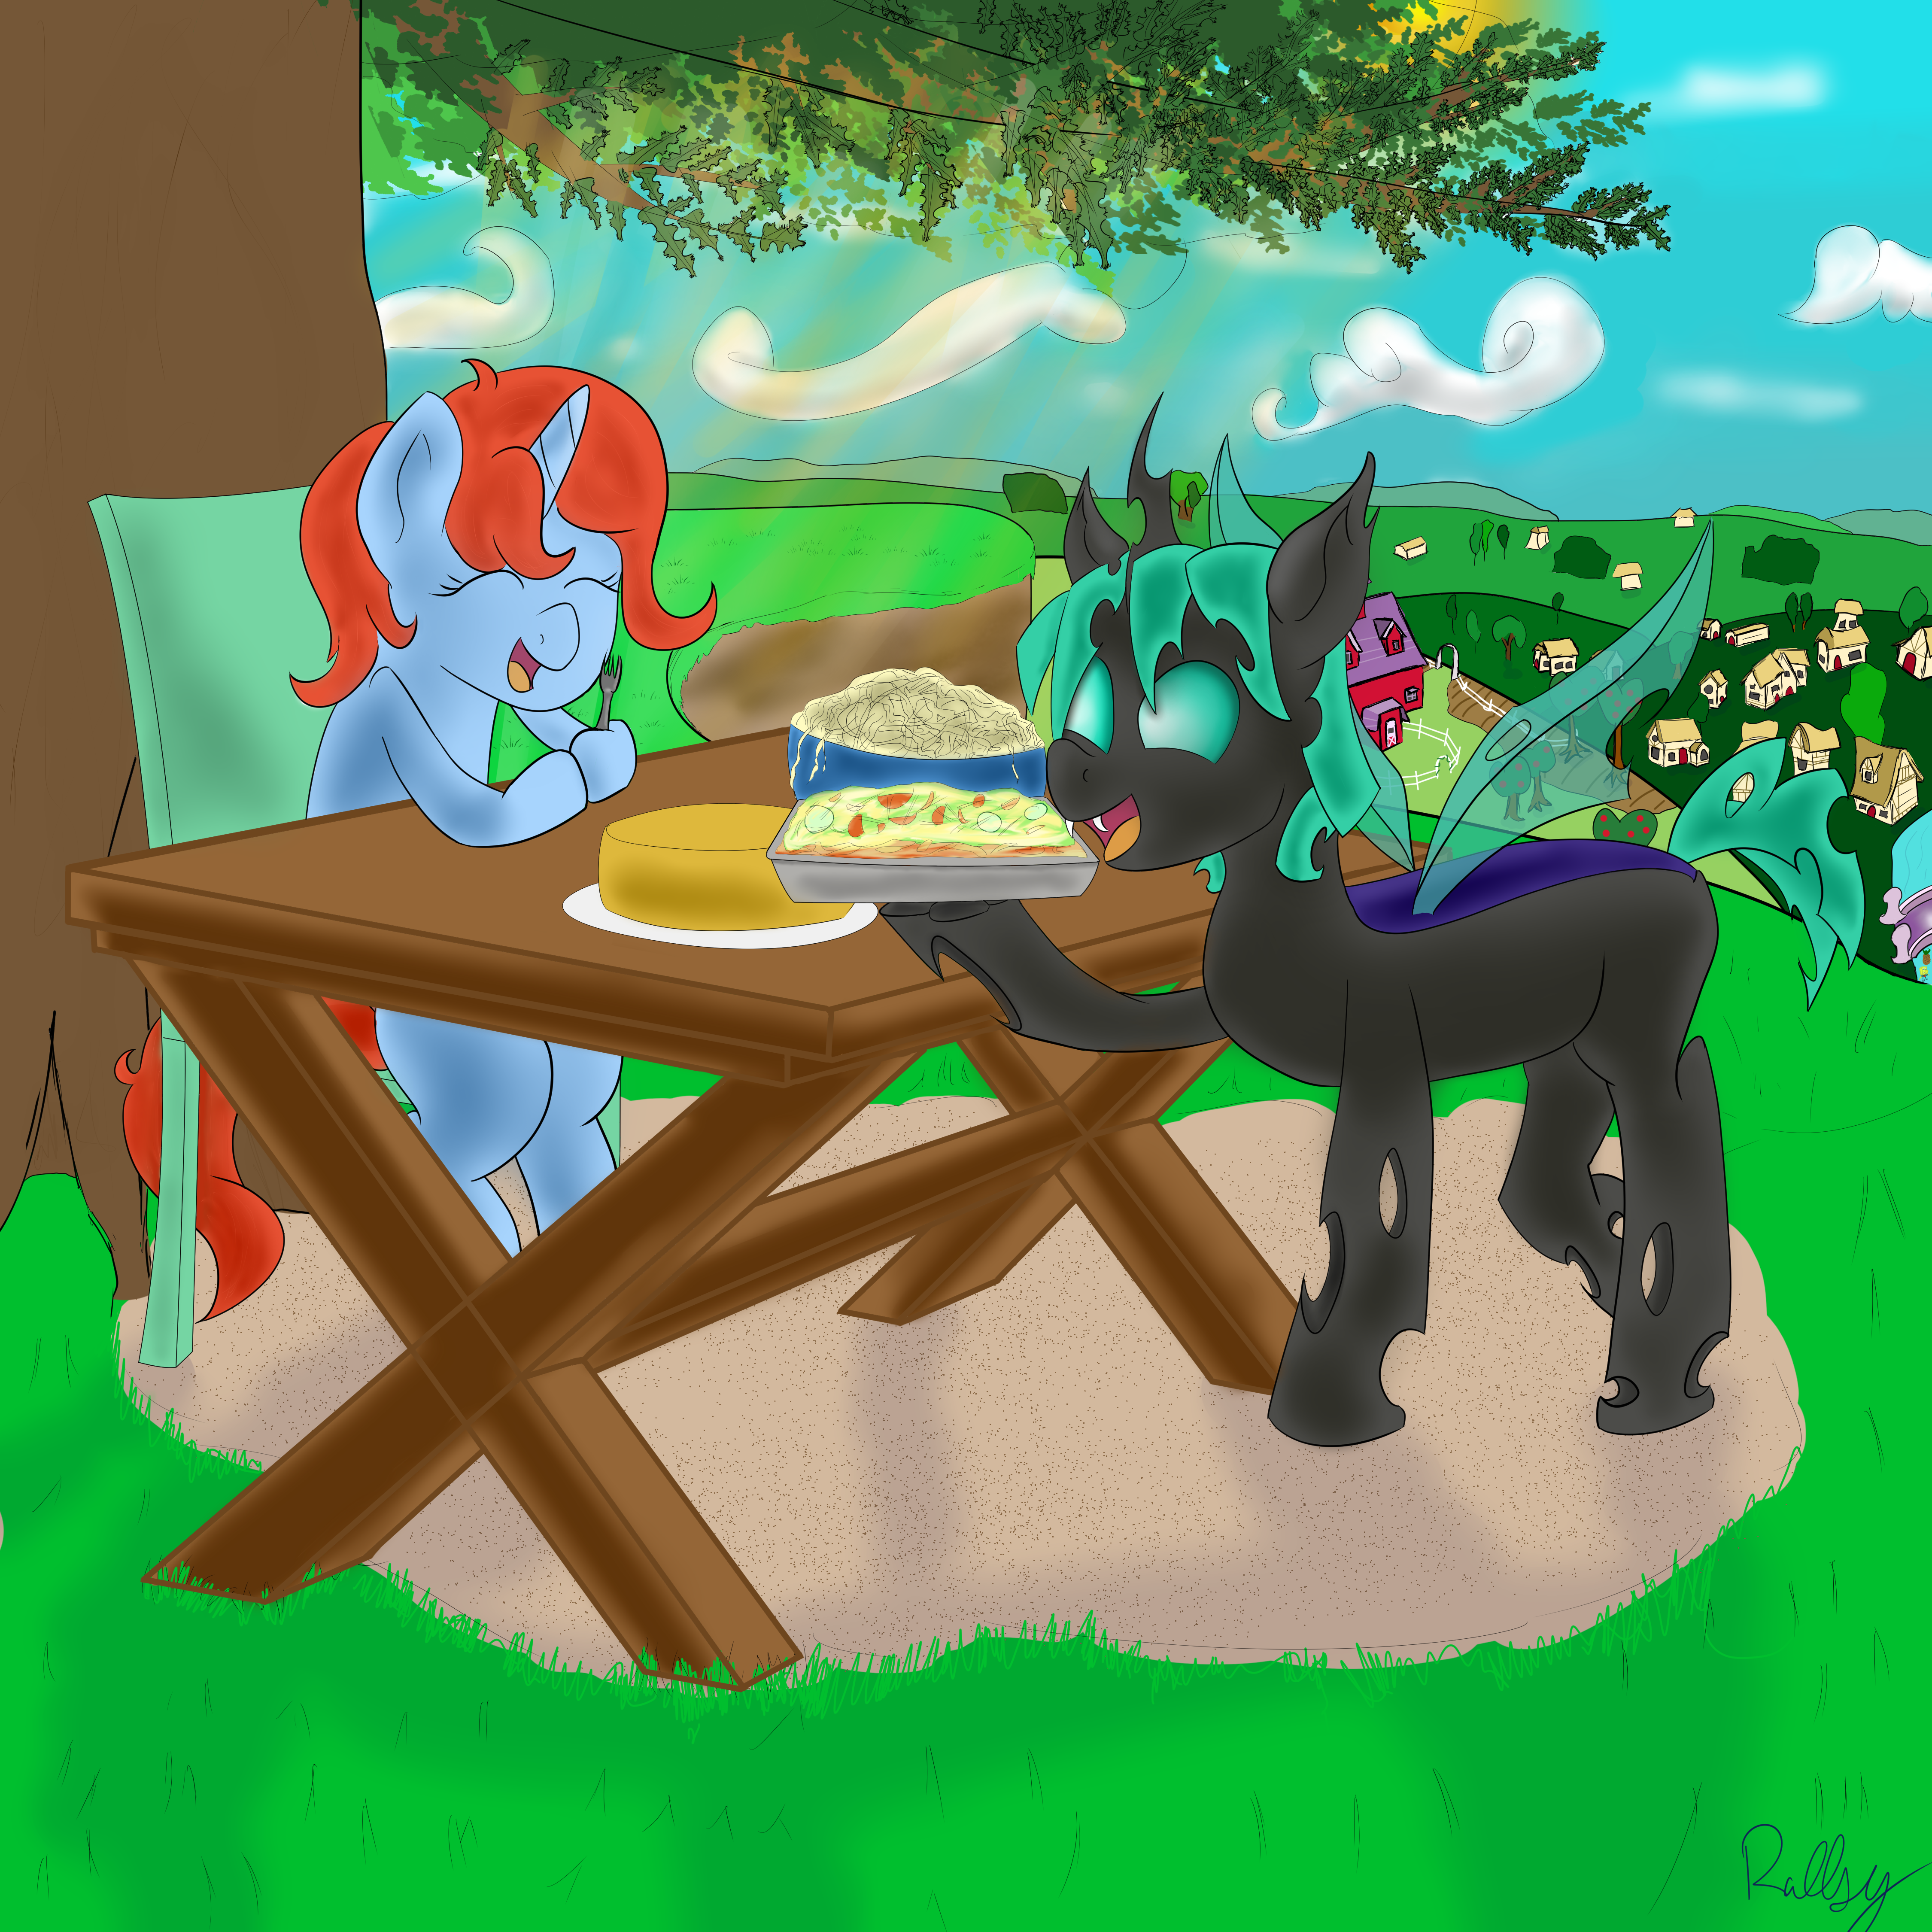 picnic panic fanfiction